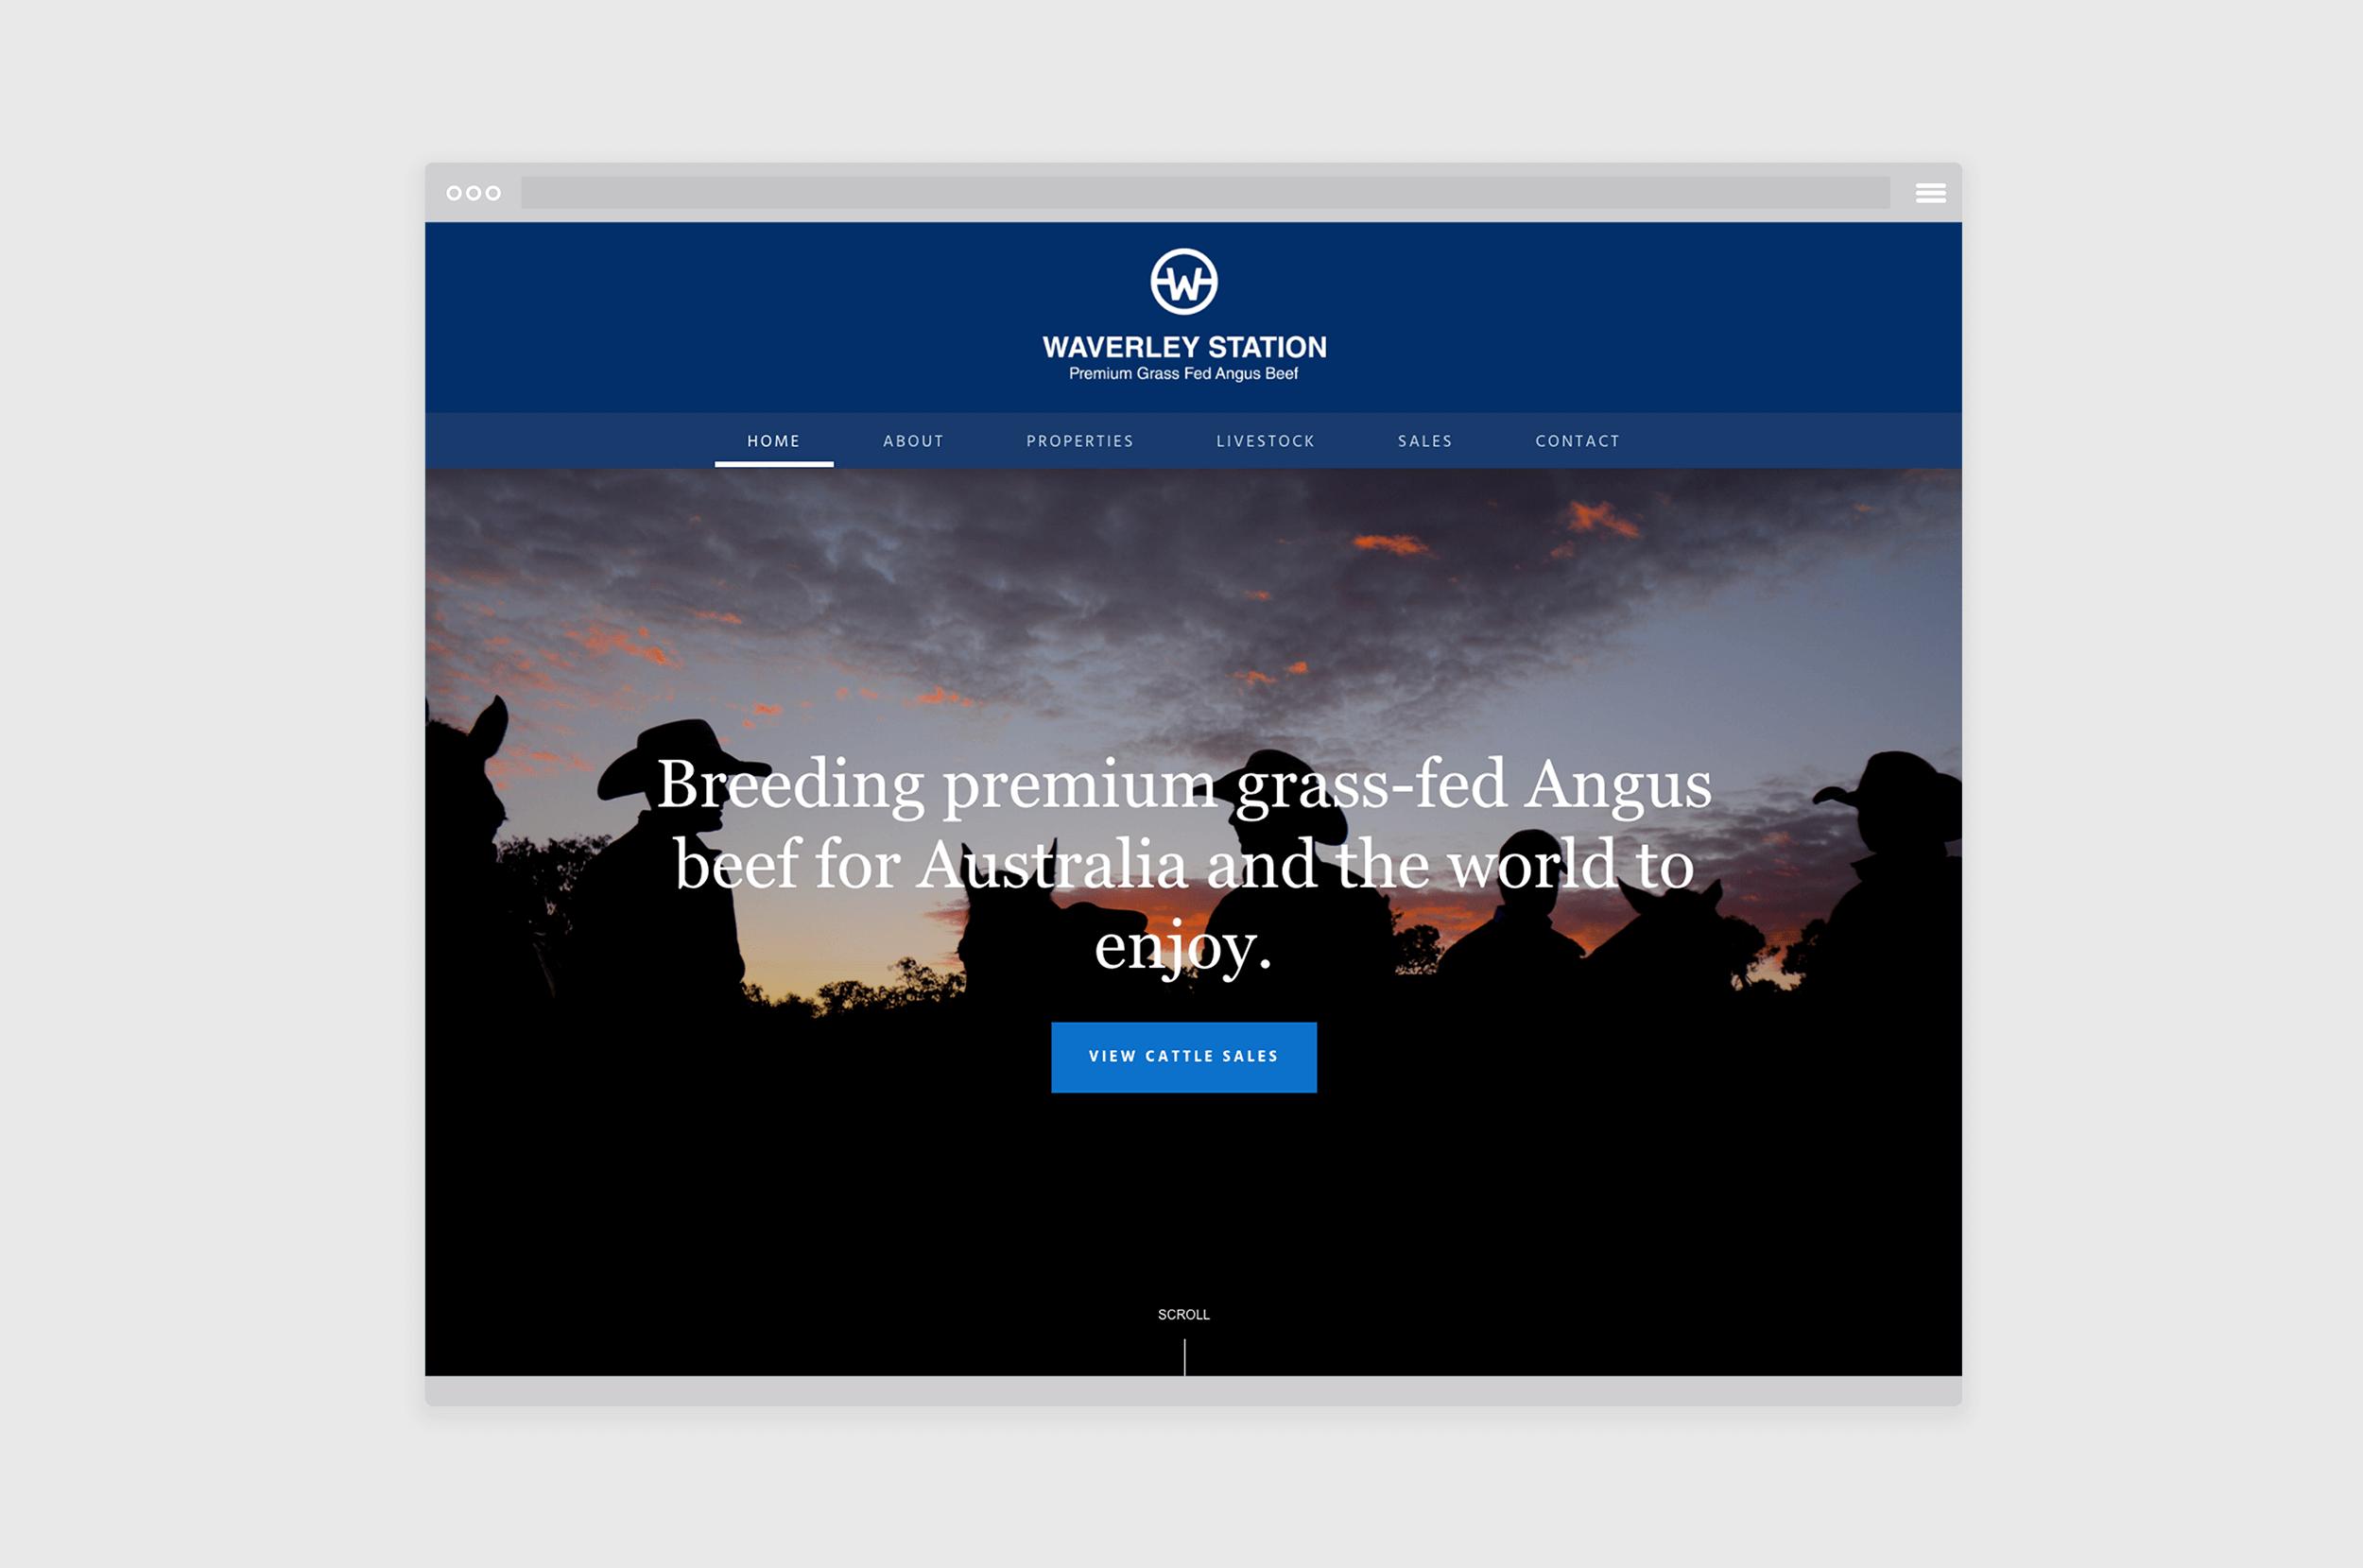 branding-squarespace-web-desgin-melbourne-waverley-station.png